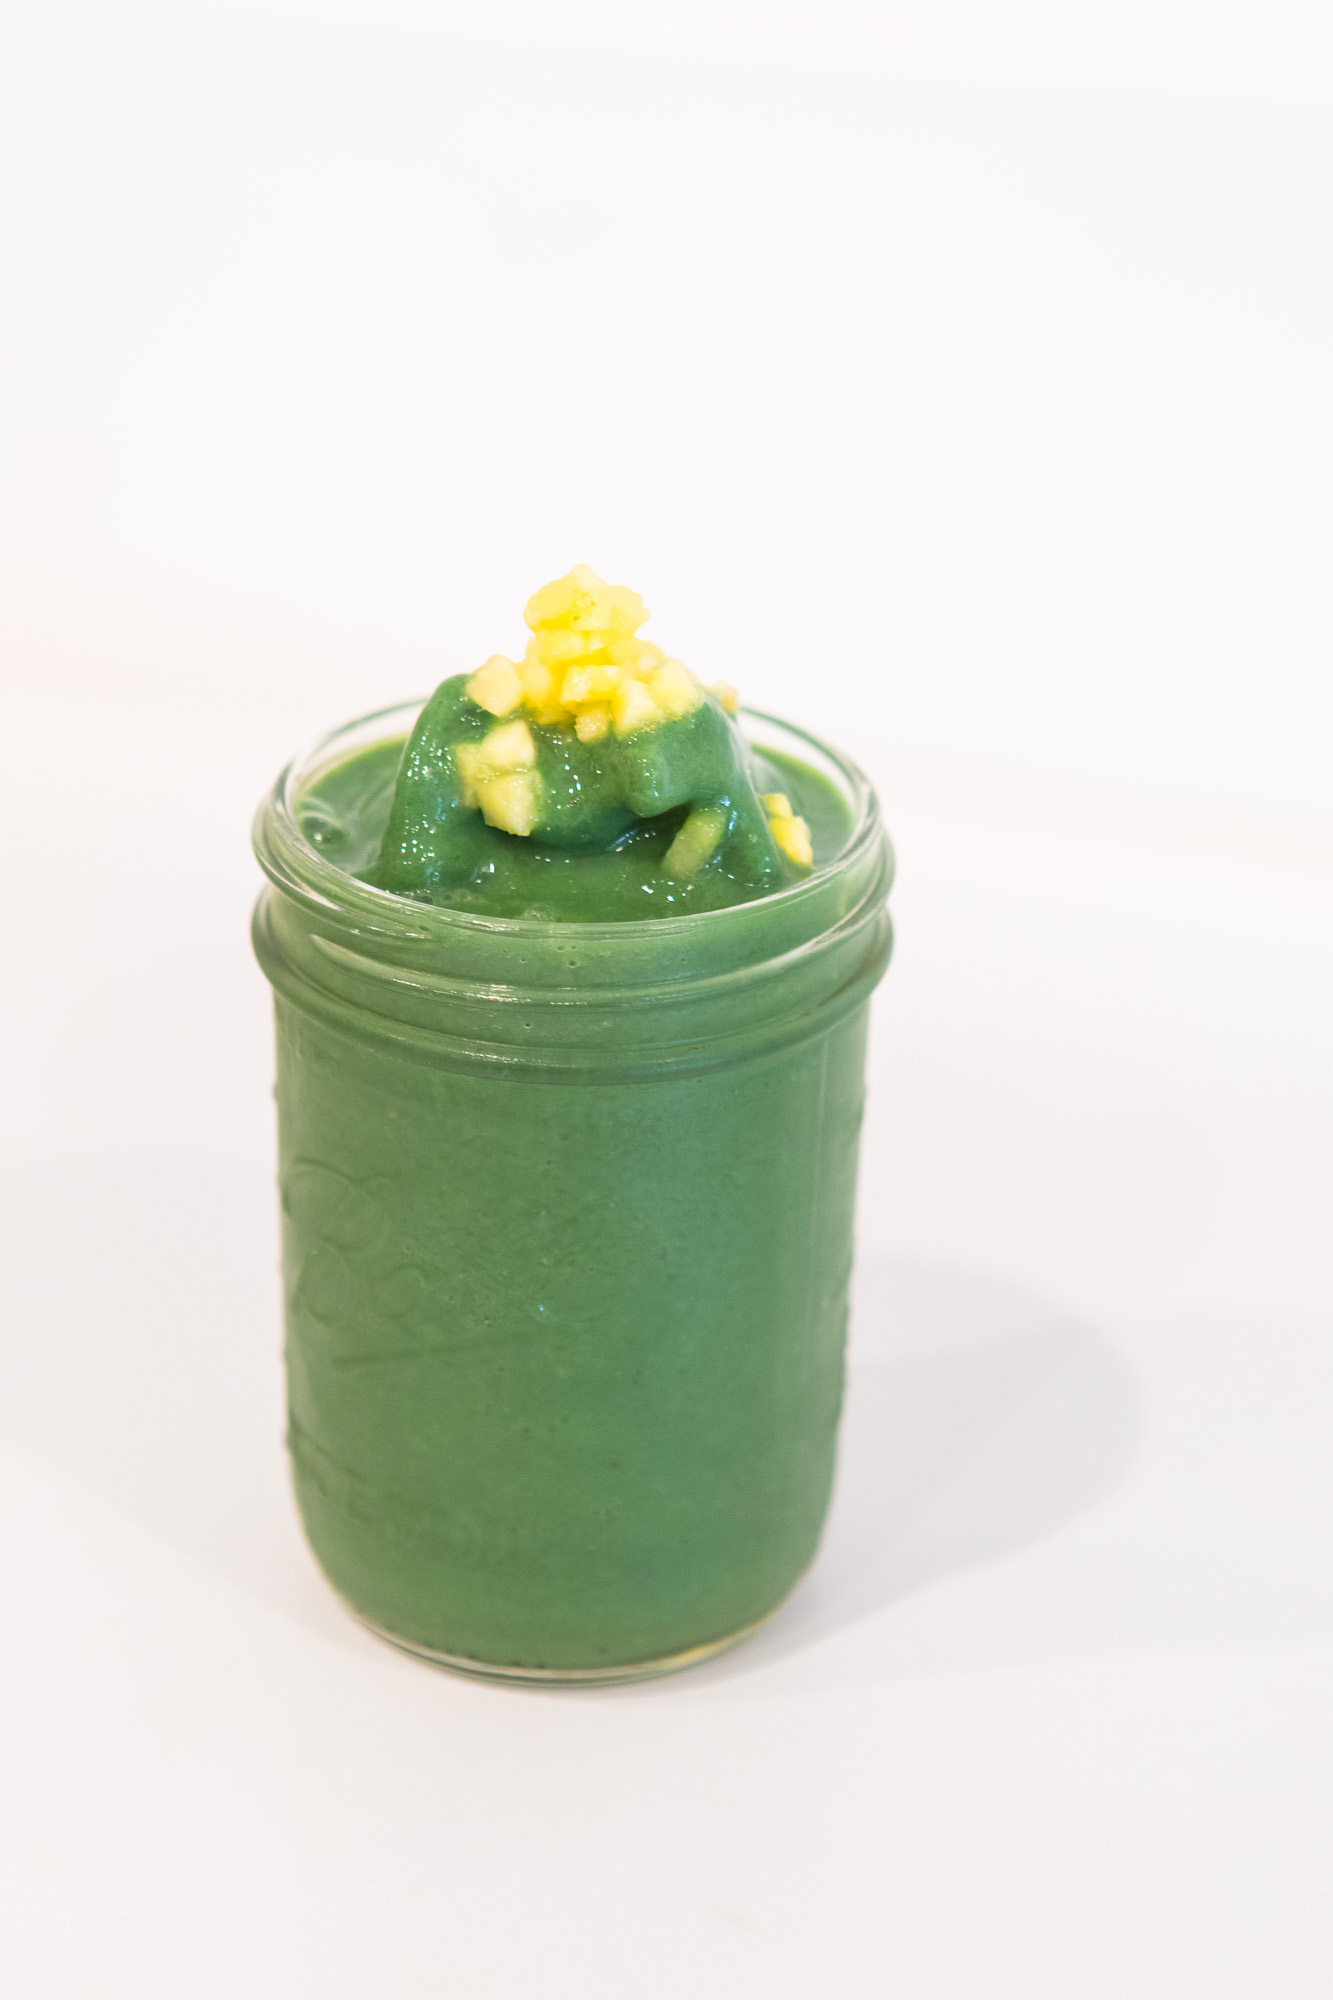 Maka-vegan-cafe-fresh-smoothie-2.jpg